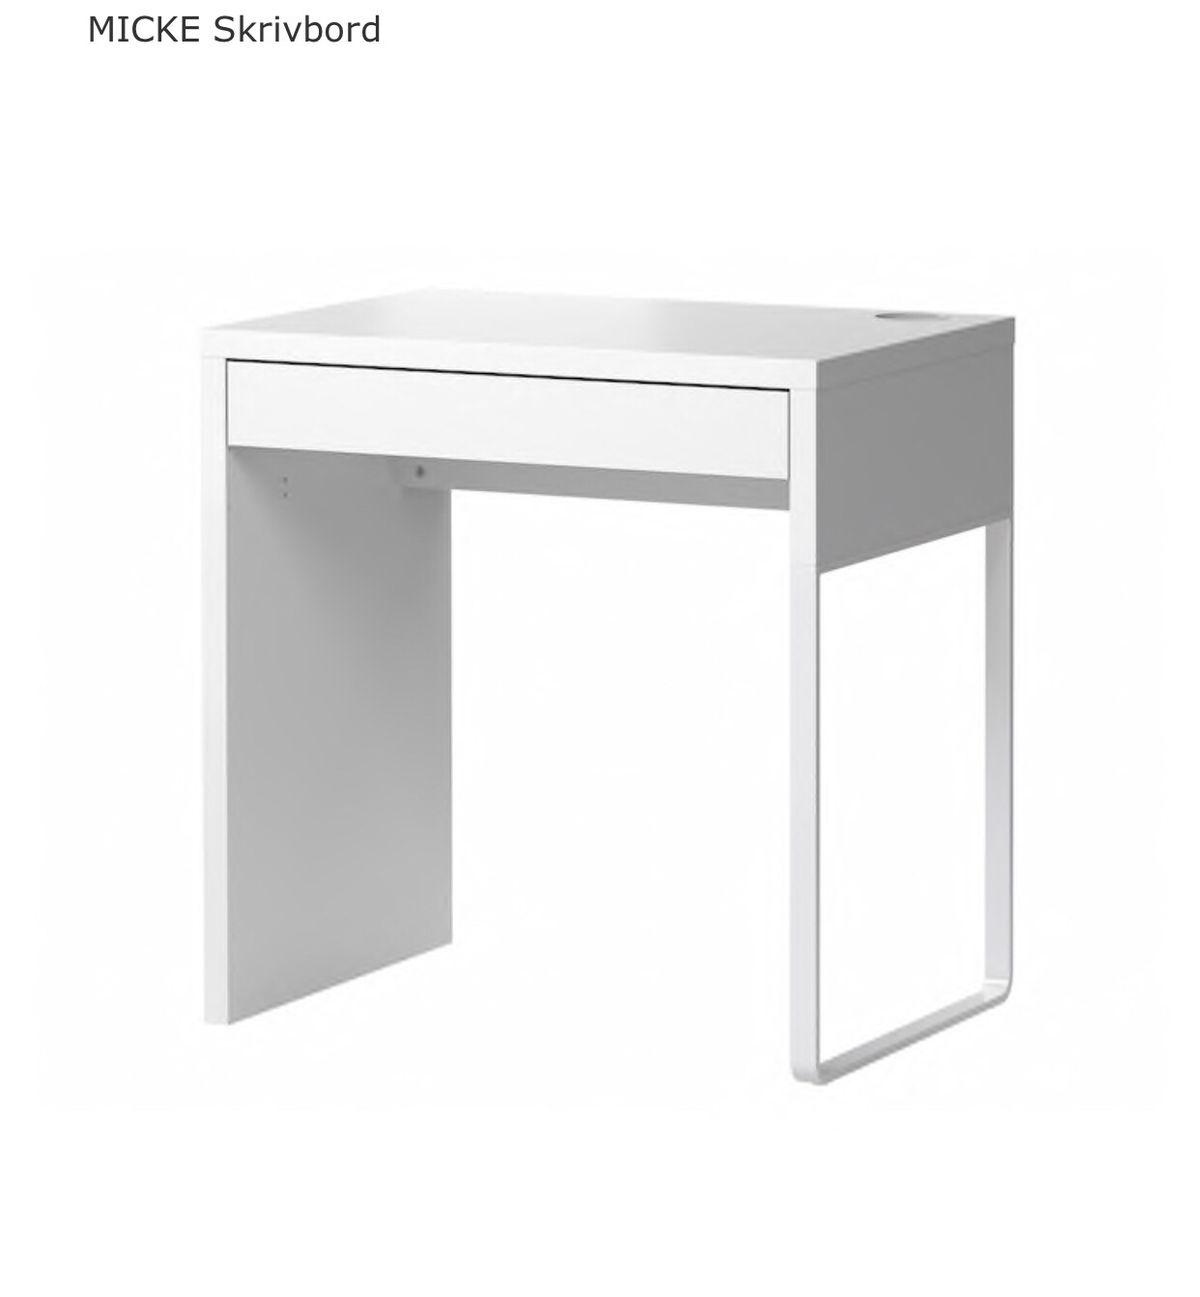 Ikea Micke-skrivbord